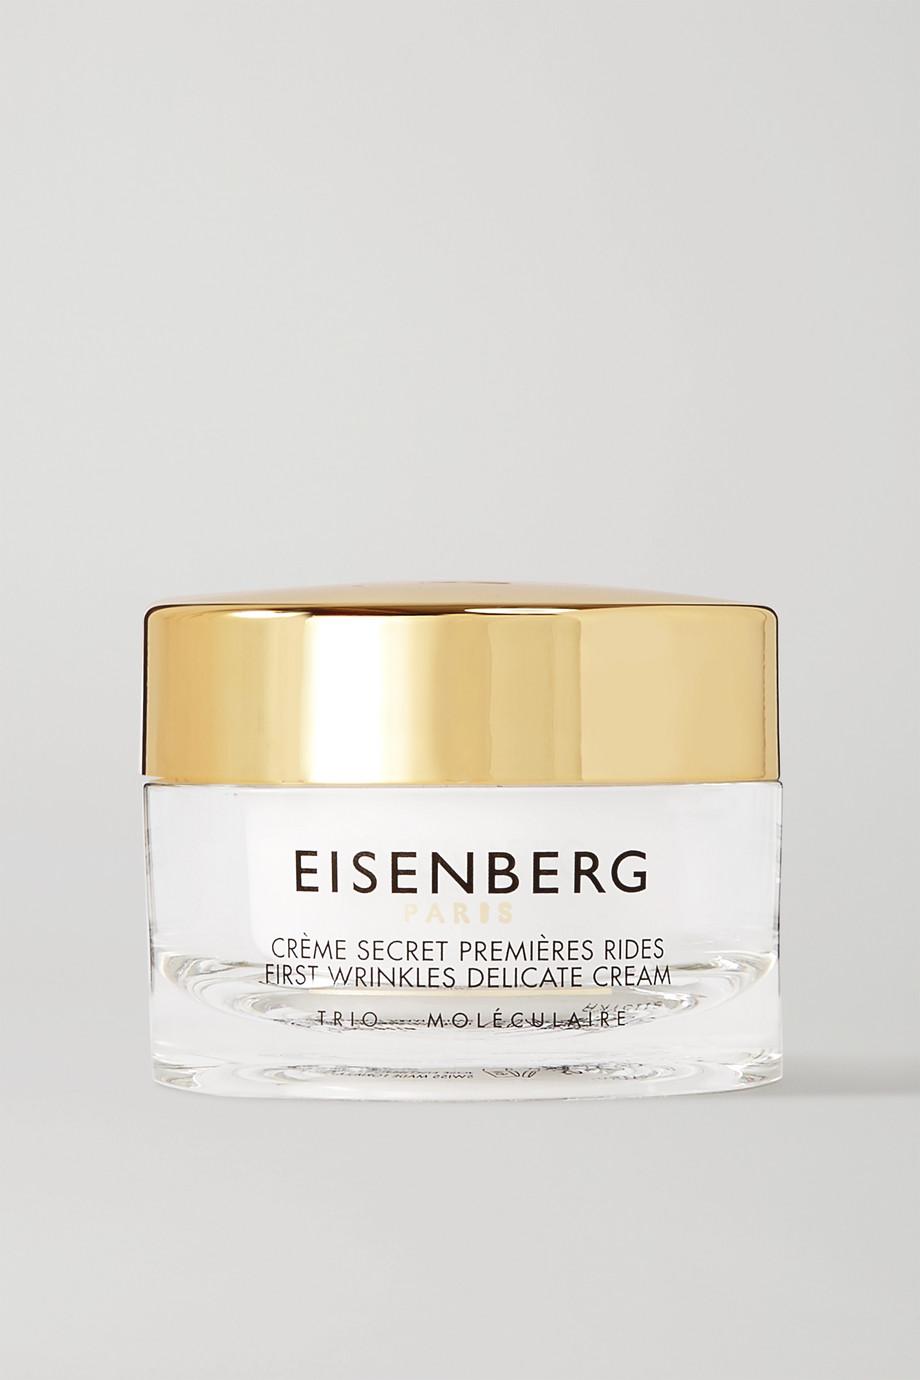 EISENBERG Paris First Wrinkles Delicate Cream, 50 ml – Gesichtscreme